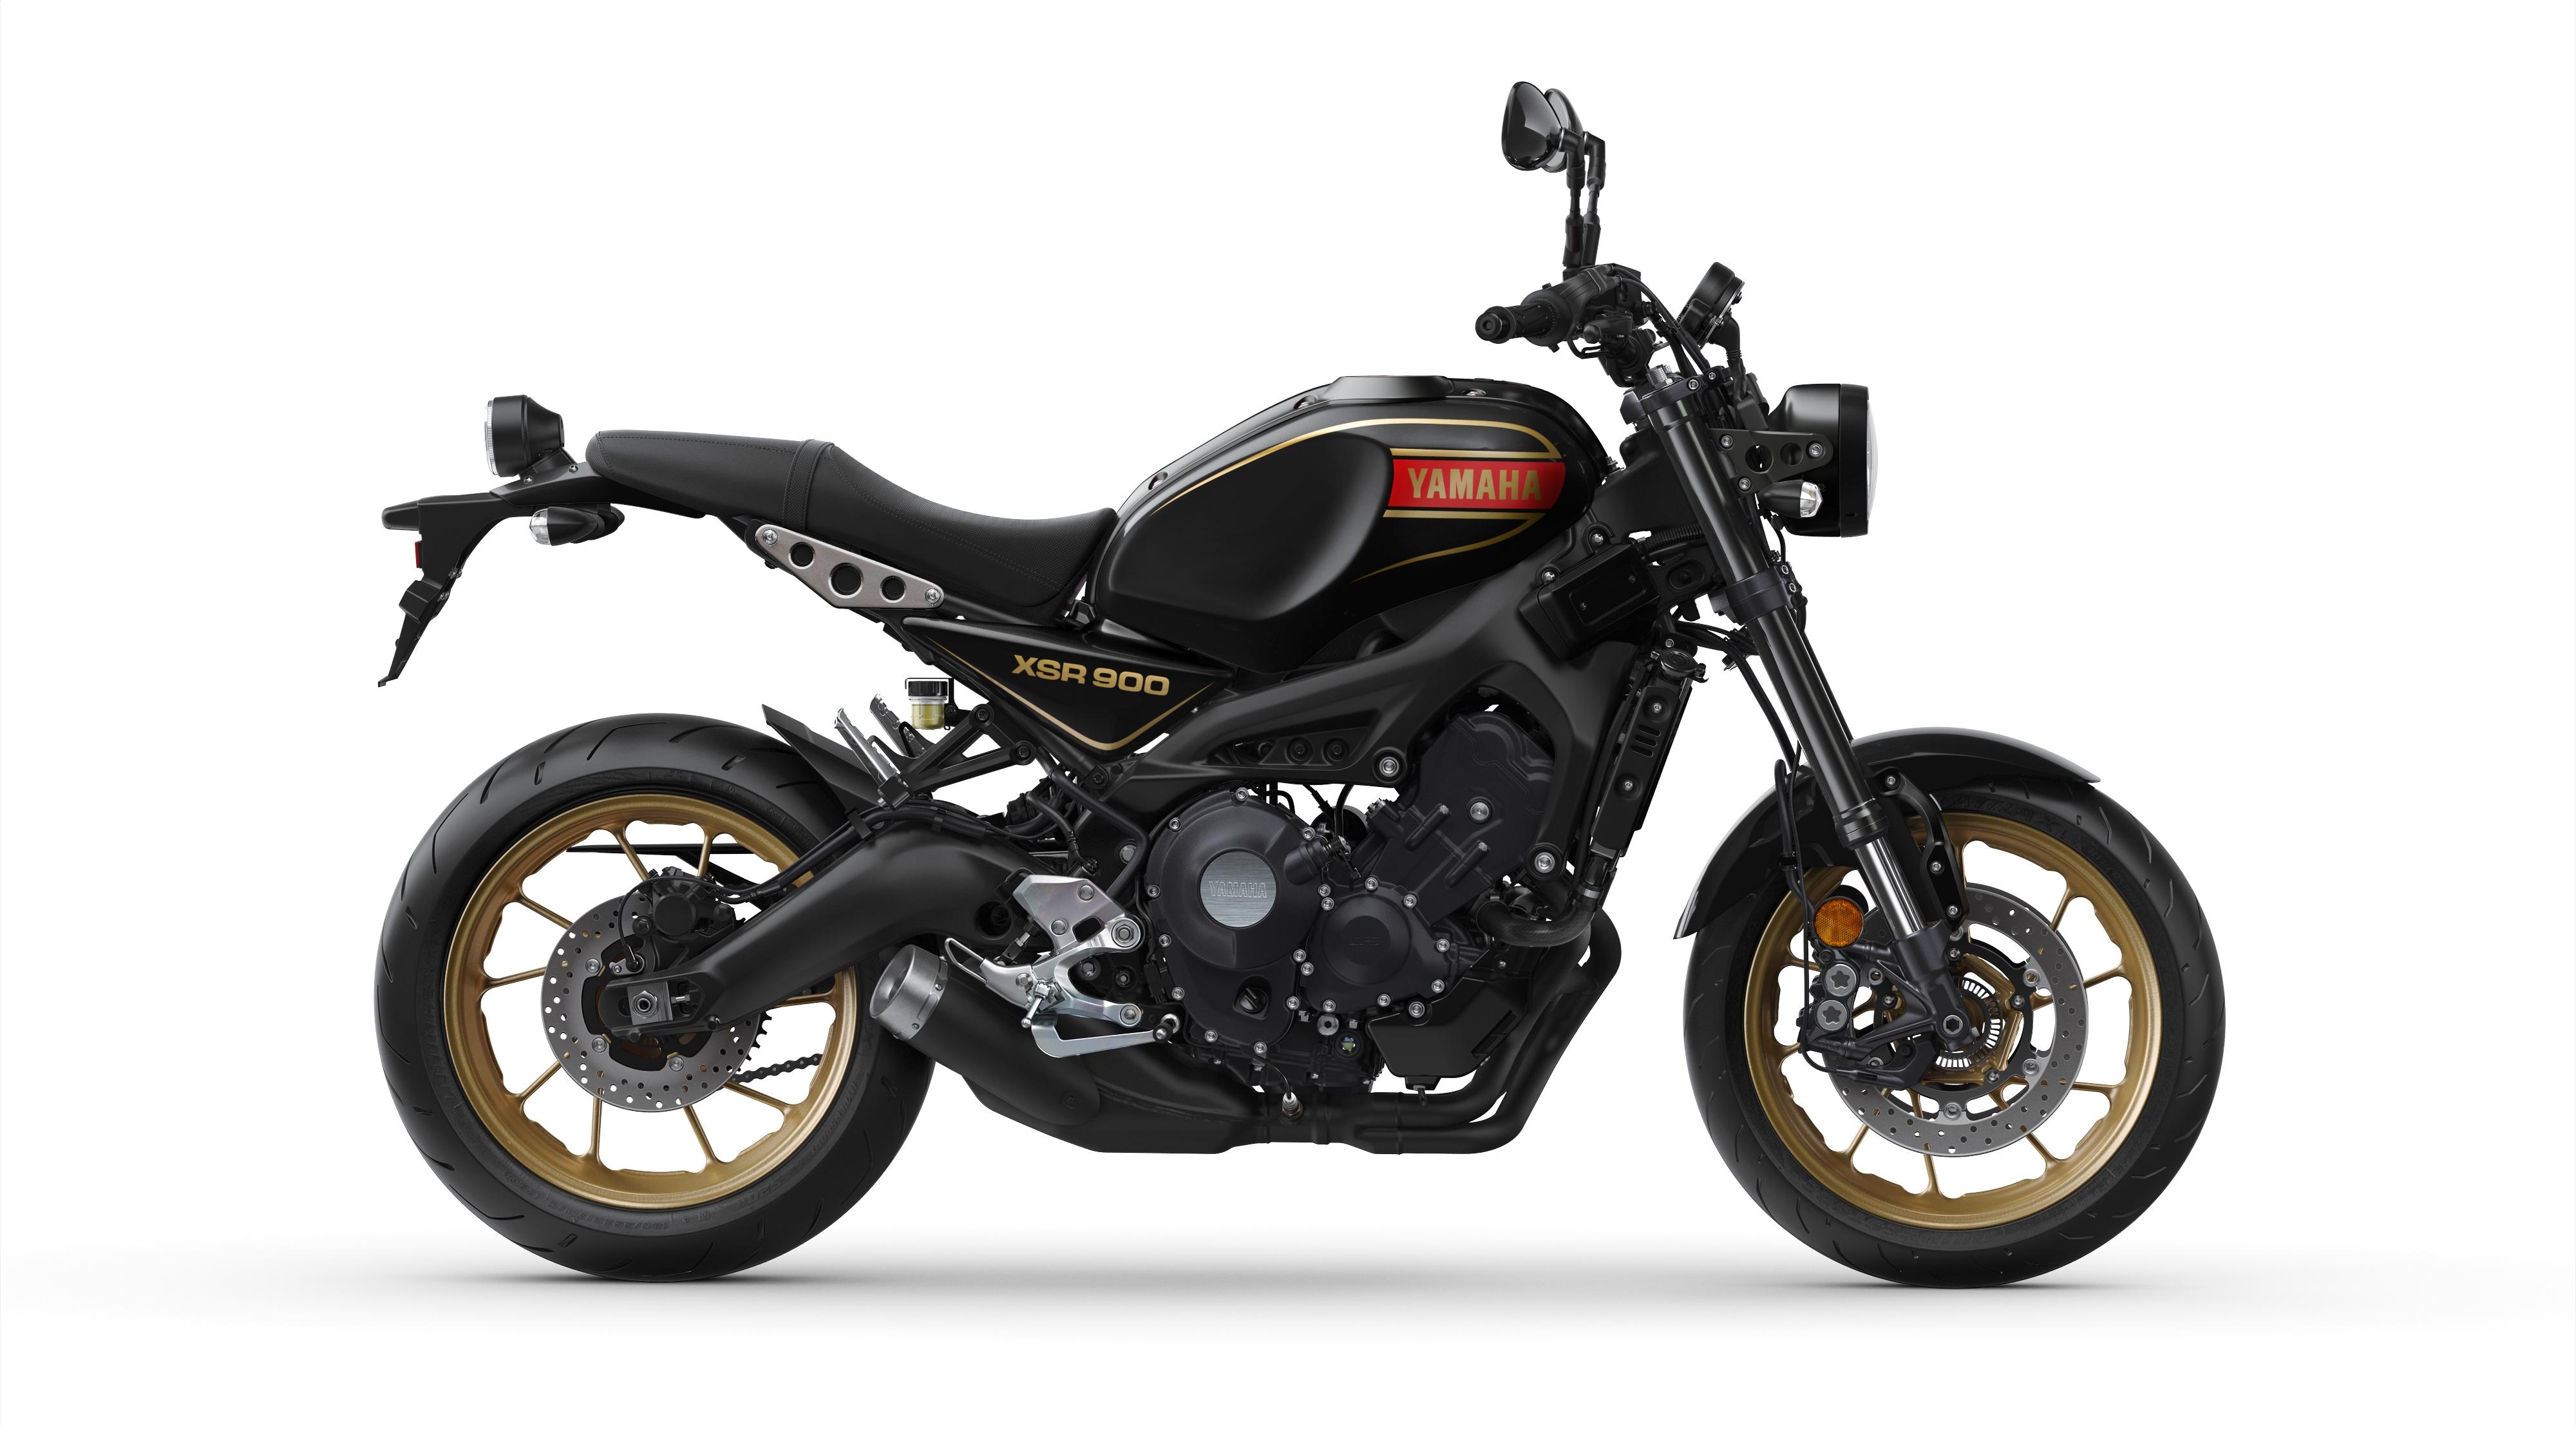 Yamaha XSR900 Sport Heritage